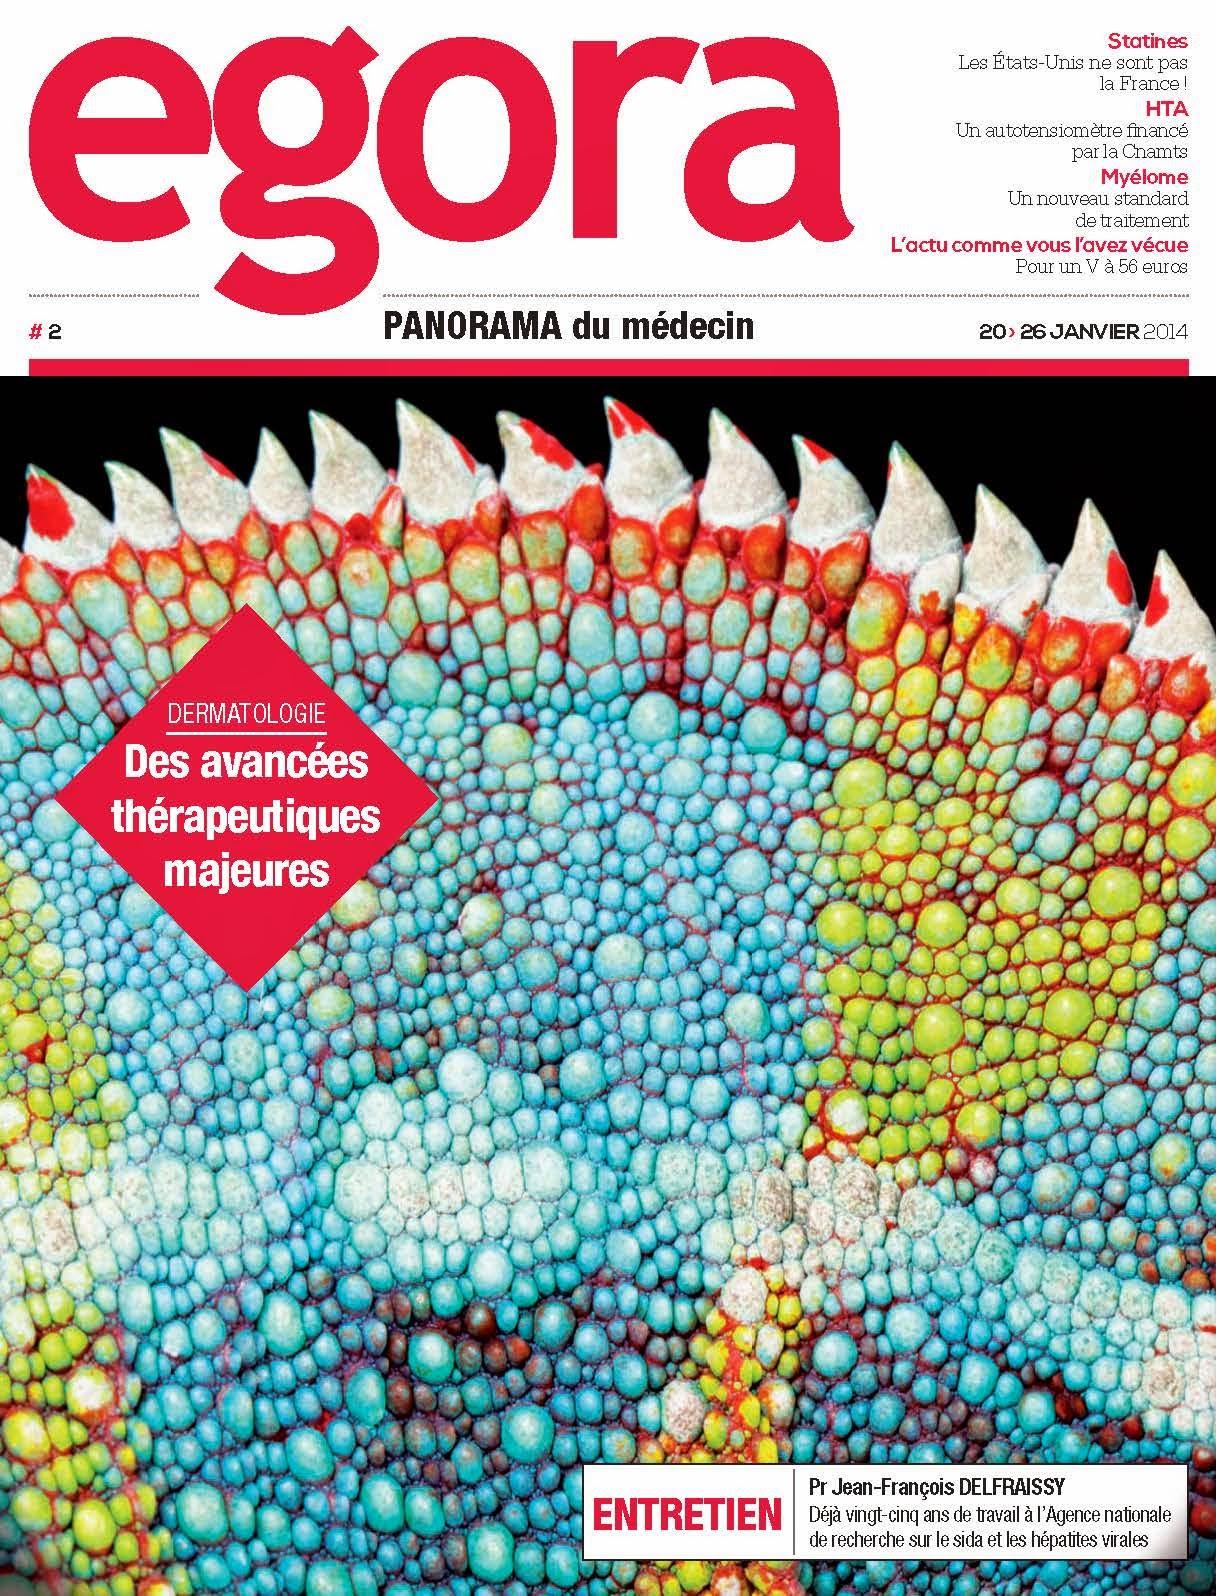 Egora - Panorama du médecin no 2, 20-26 Janvier 2014